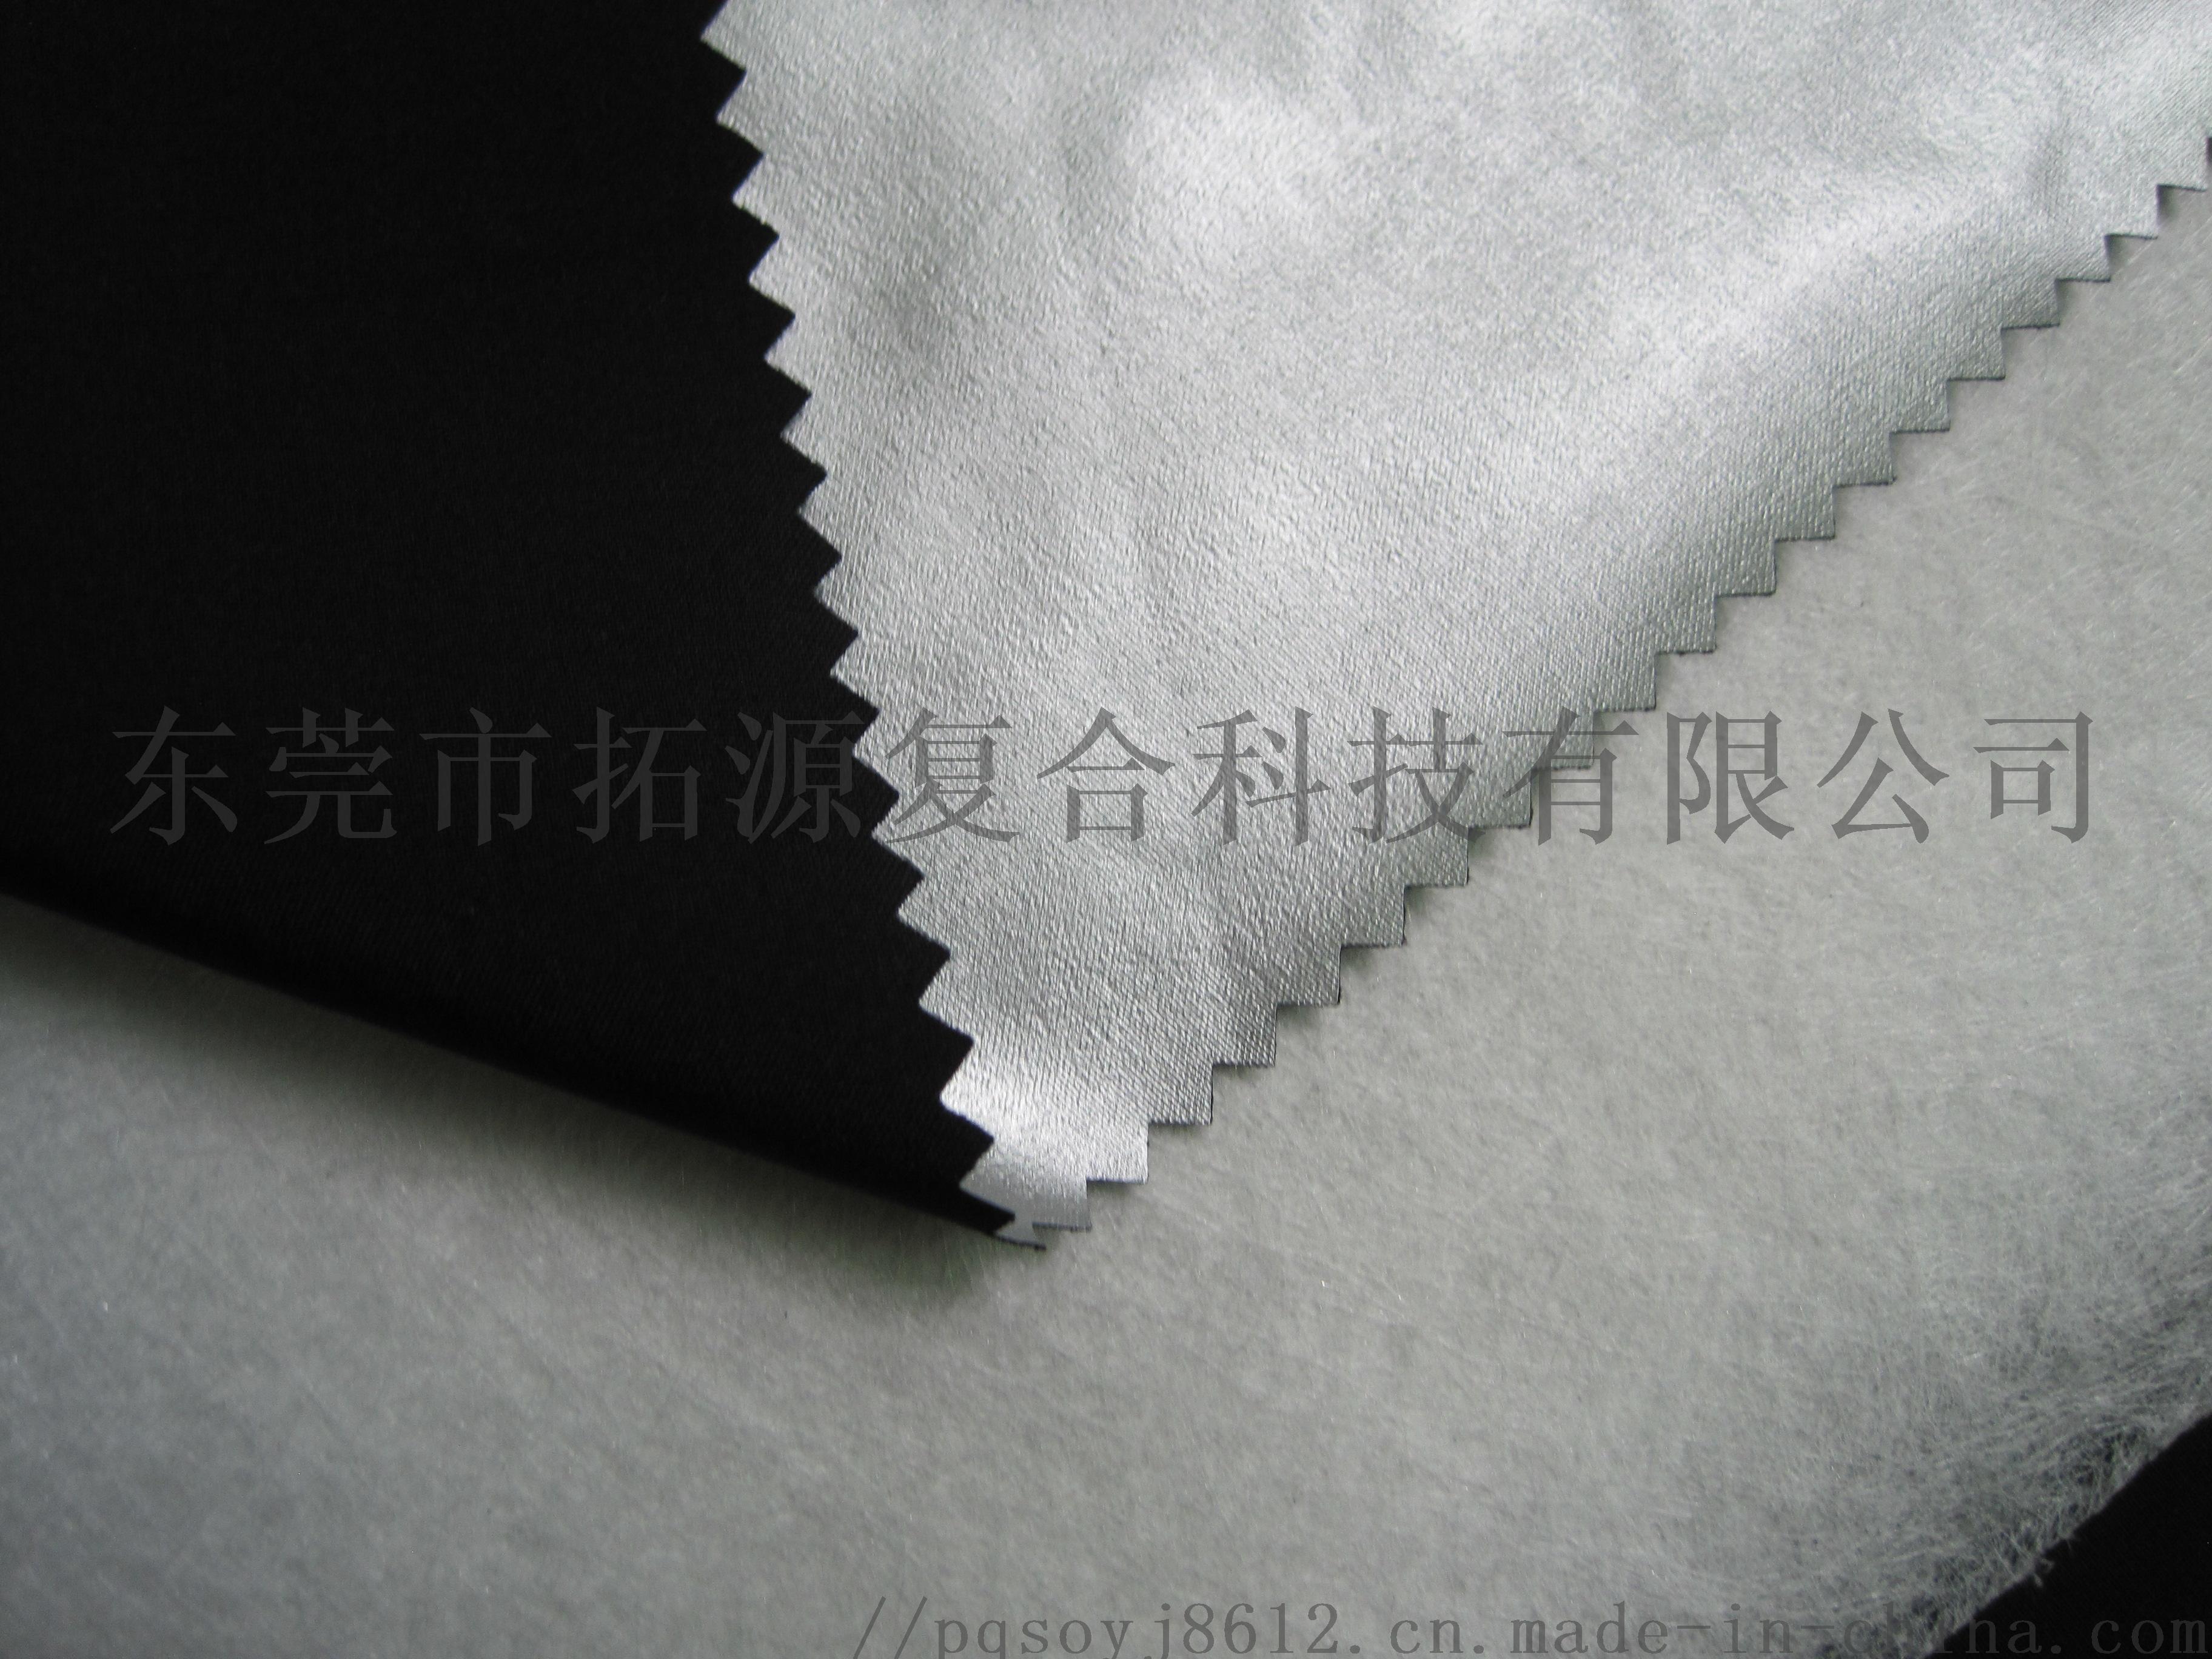 IMG_5410.JPG